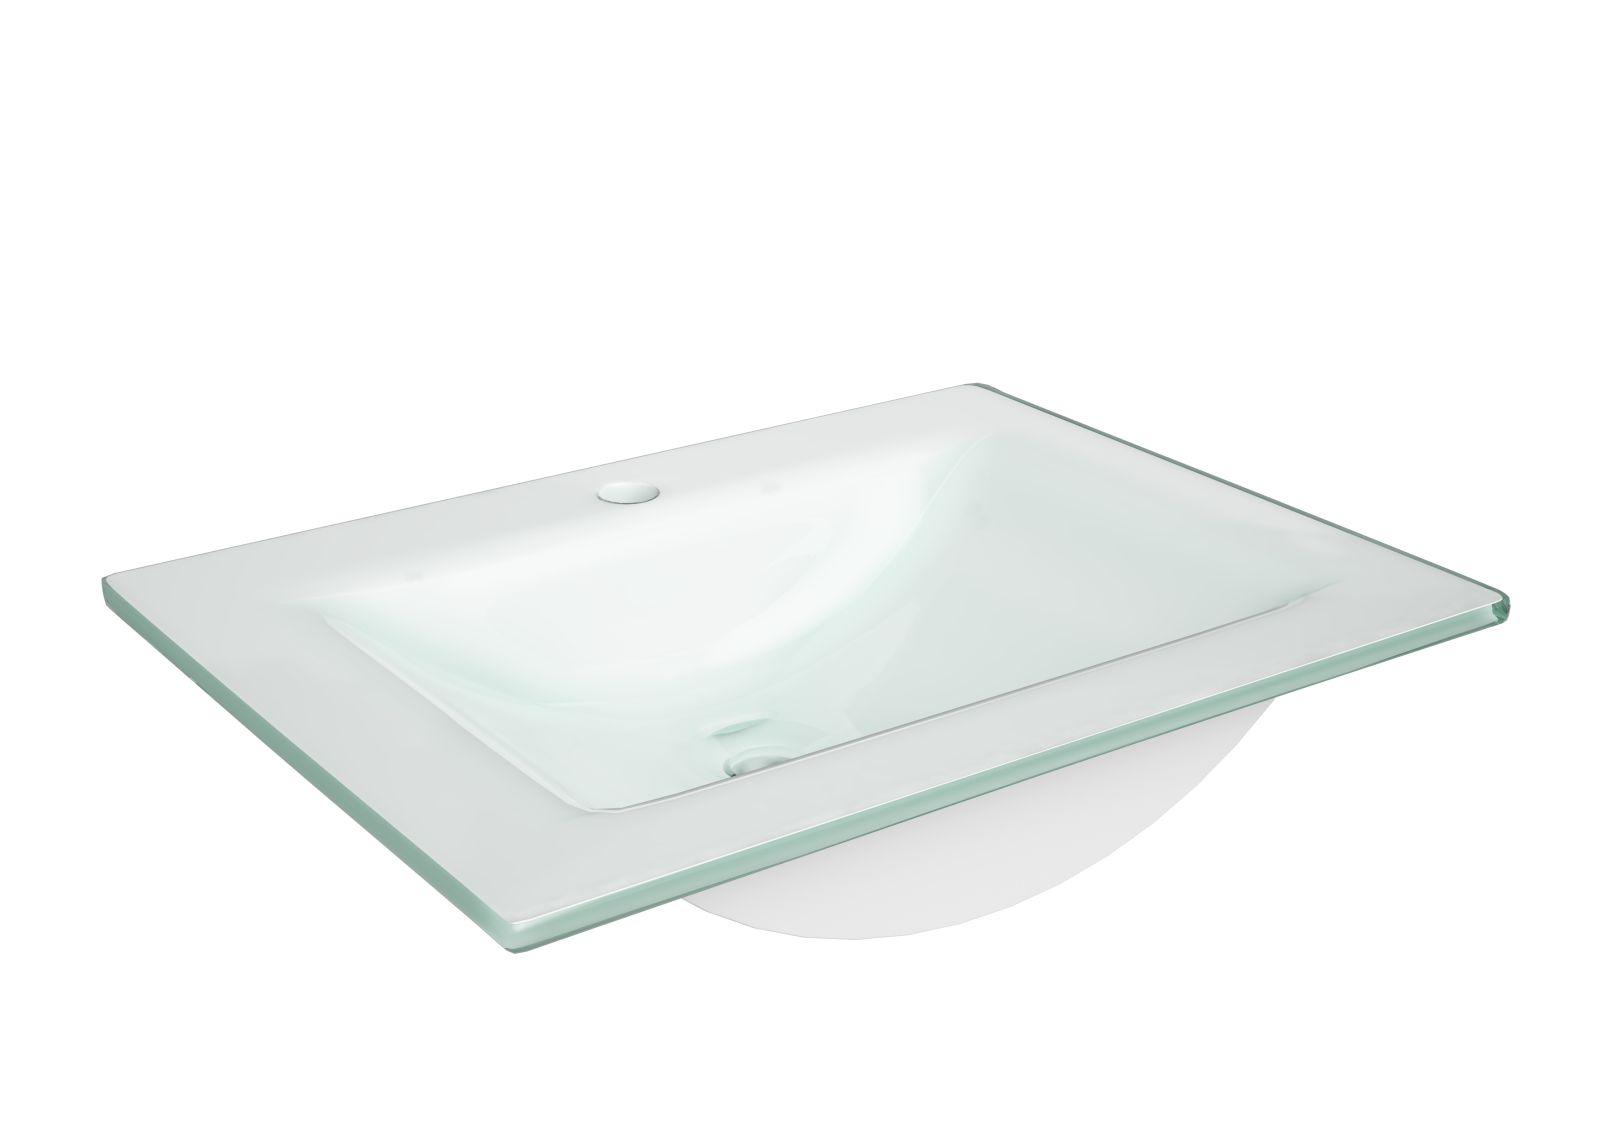 Umywalka meblowa Defra Puro 60 szklana biała 3072